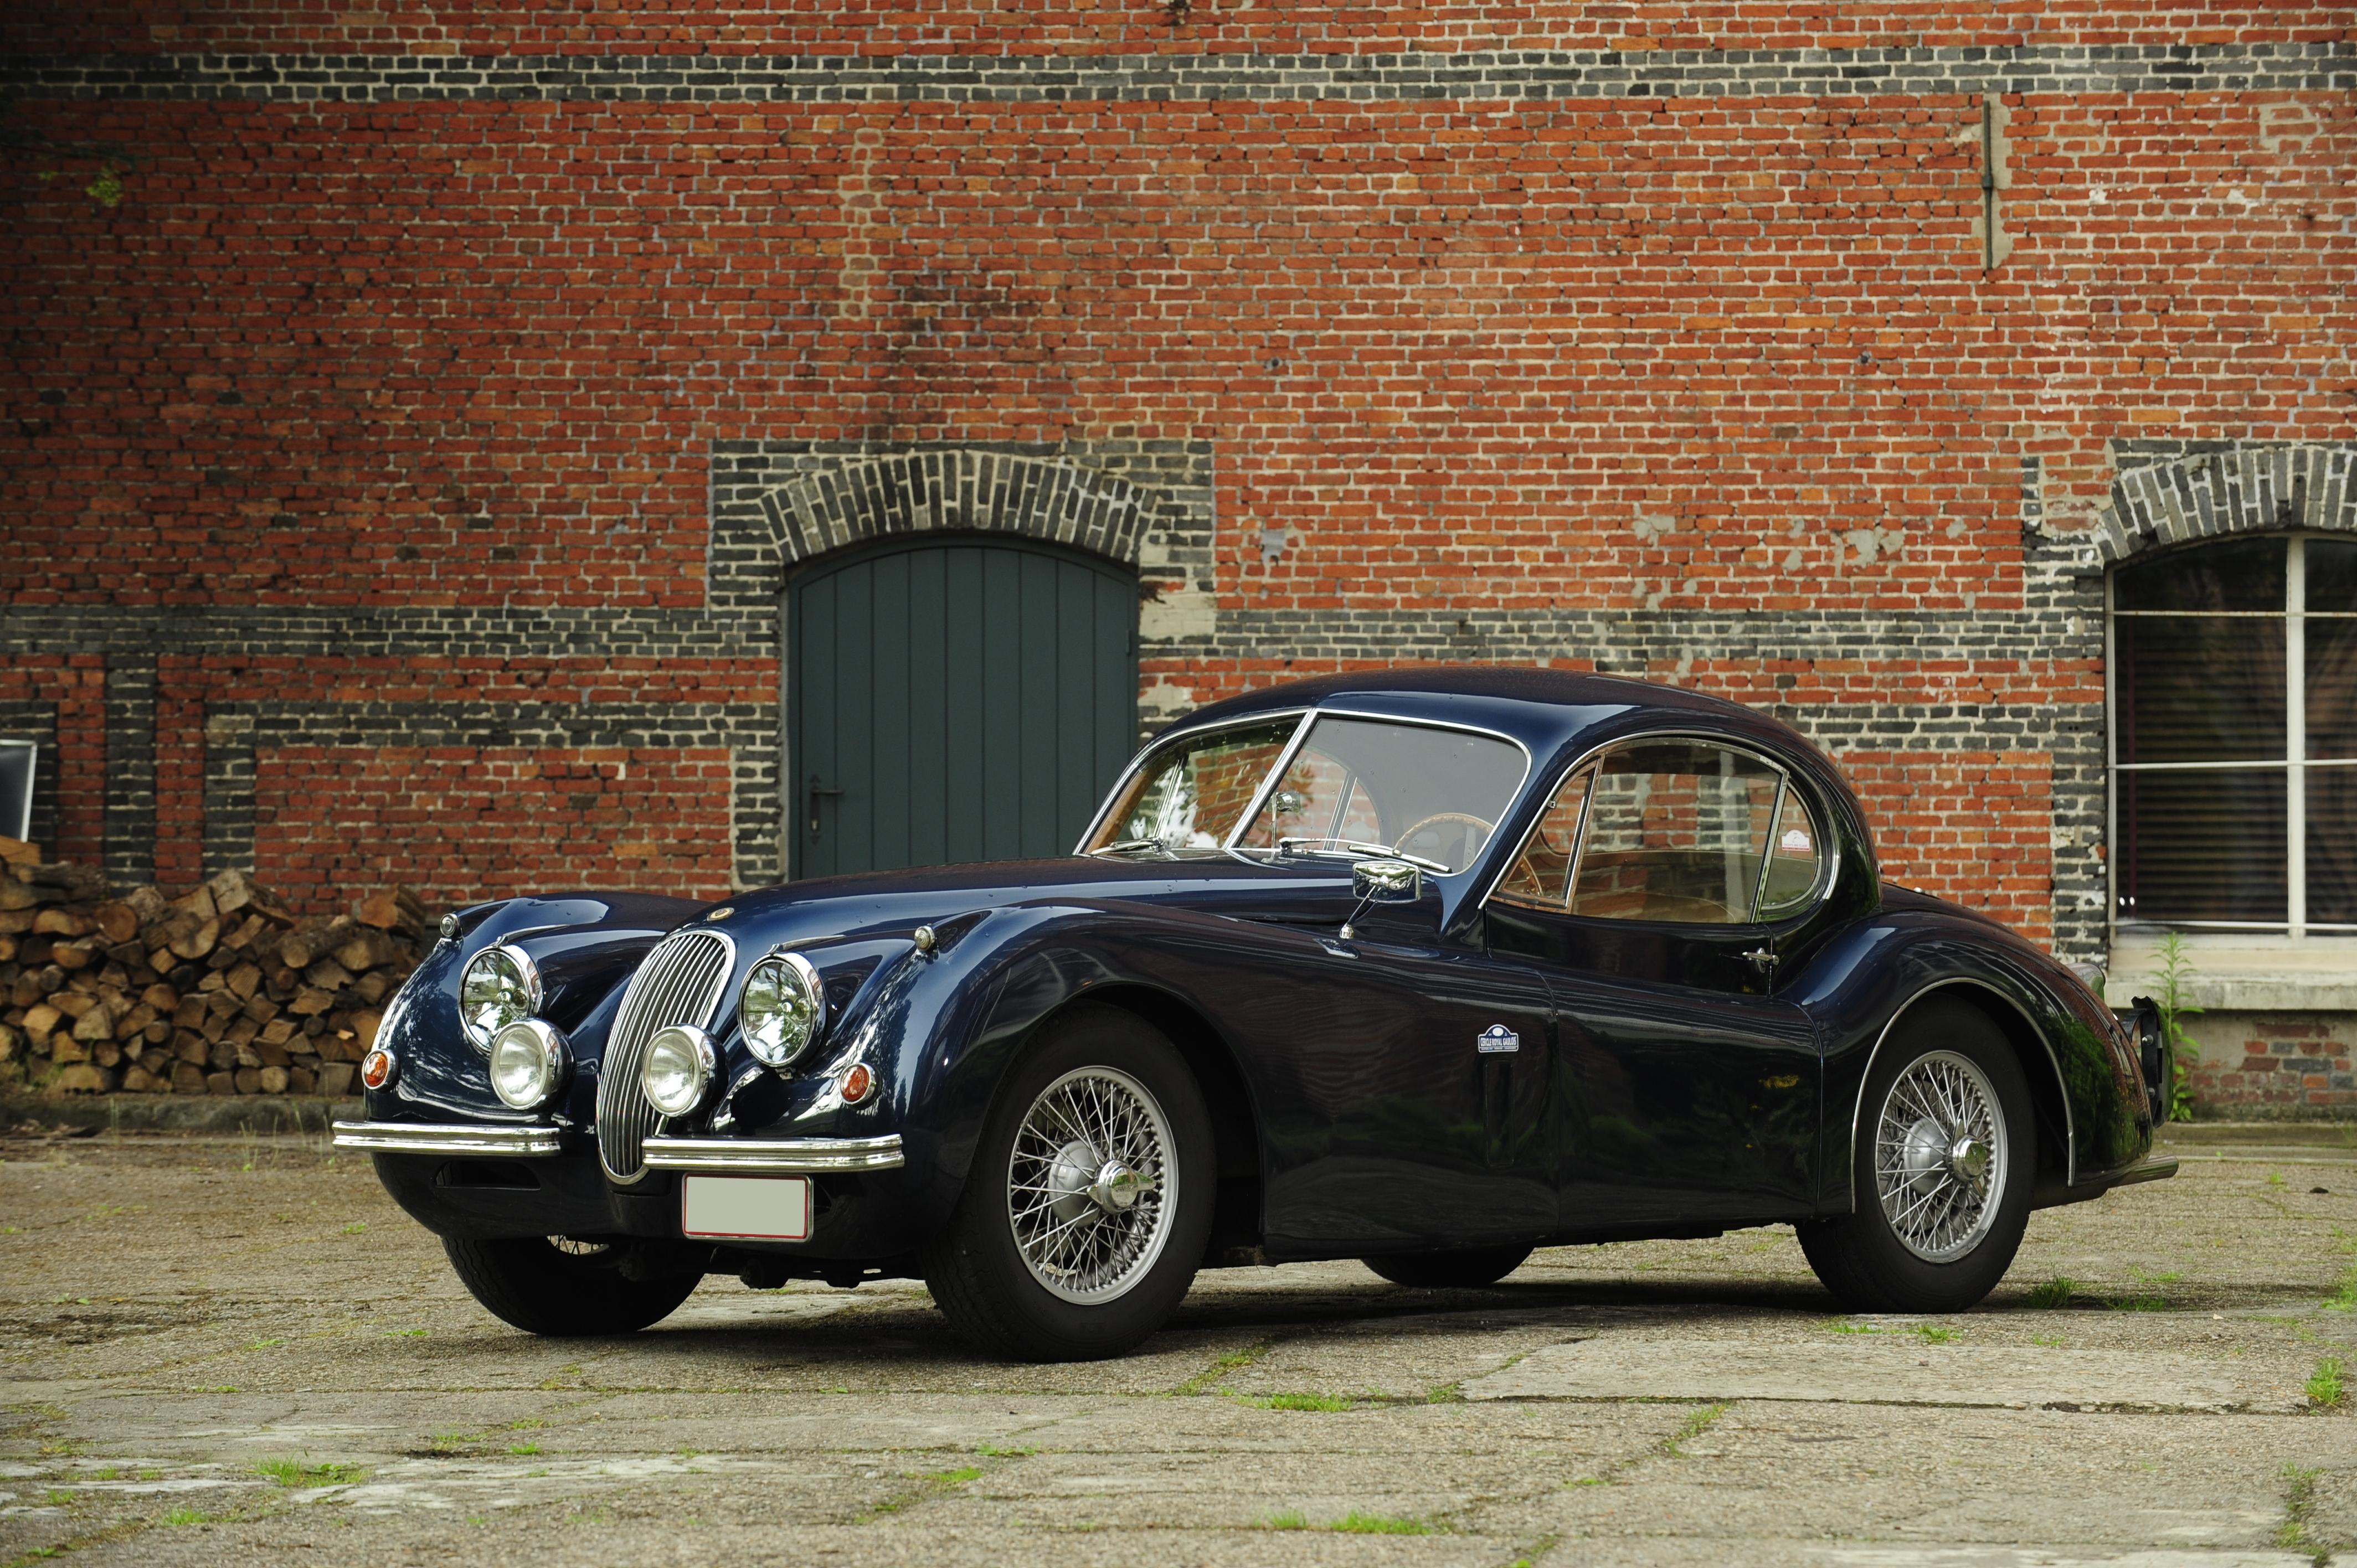 1952 jaguar xk 120 coupe classic driver market. Black Bedroom Furniture Sets. Home Design Ideas